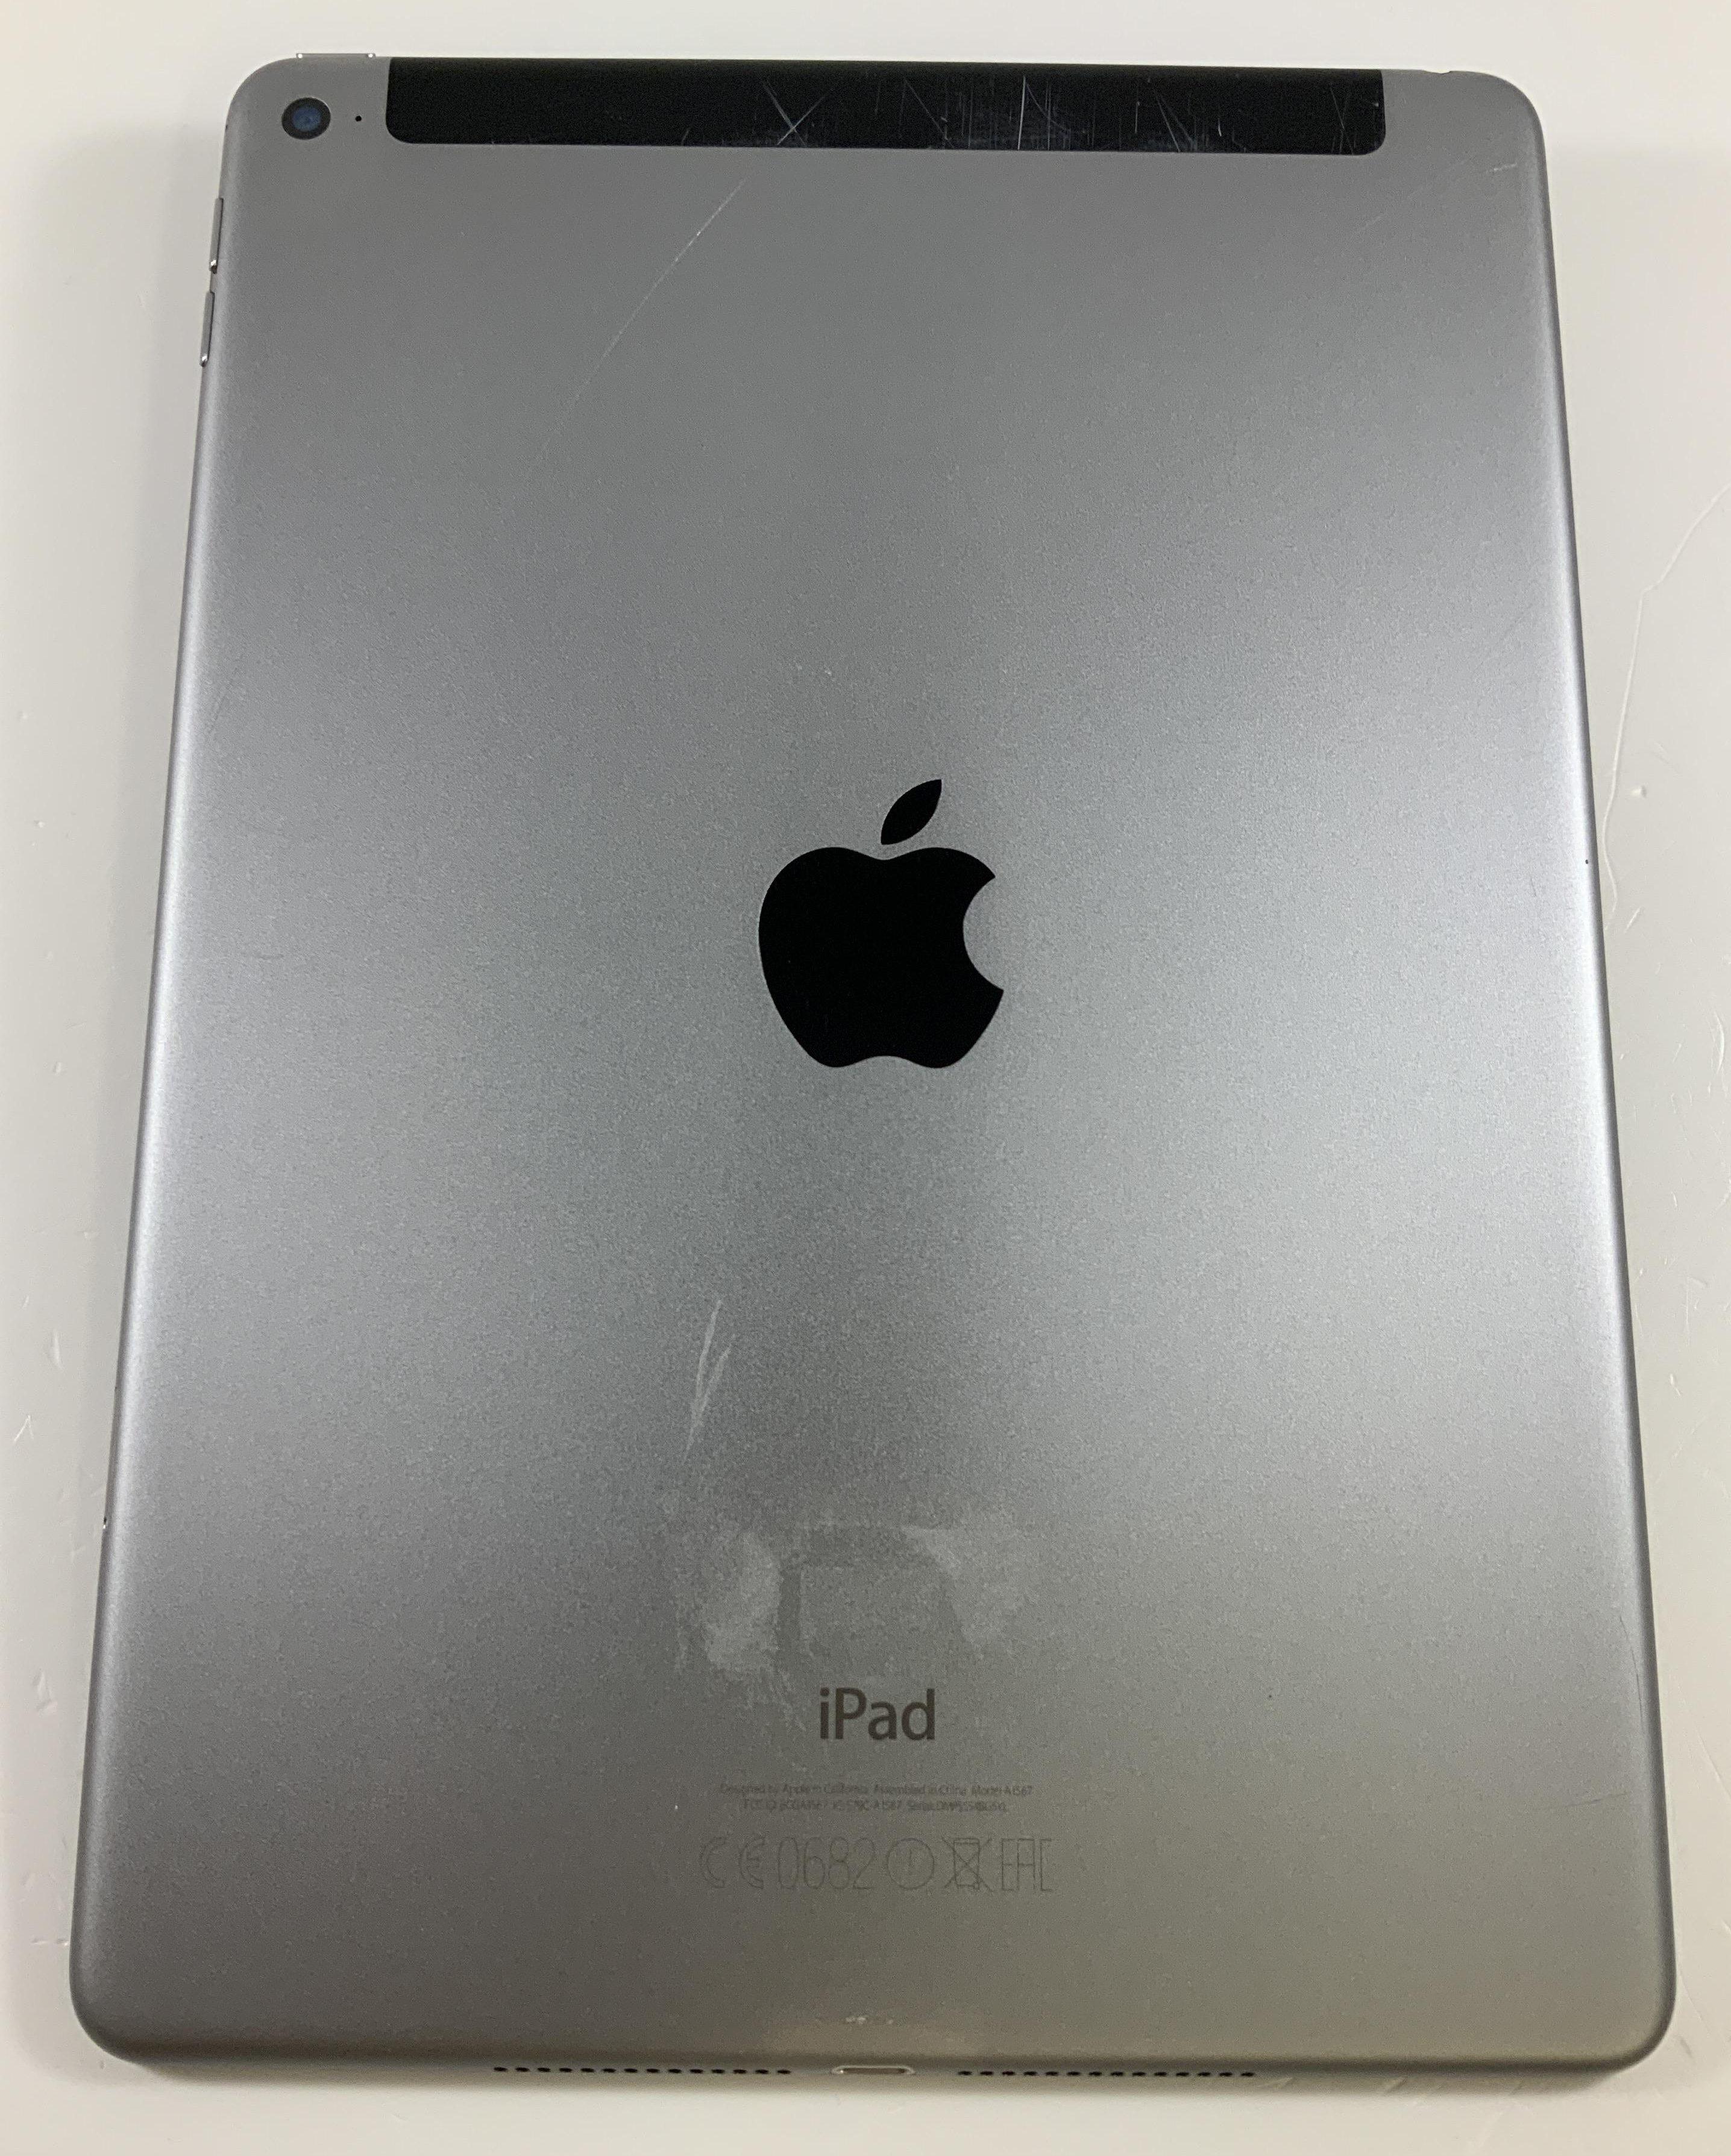 iPad Air 2 Wi-Fi + Cellular 64GB, 64GB, Space Gray, image 2